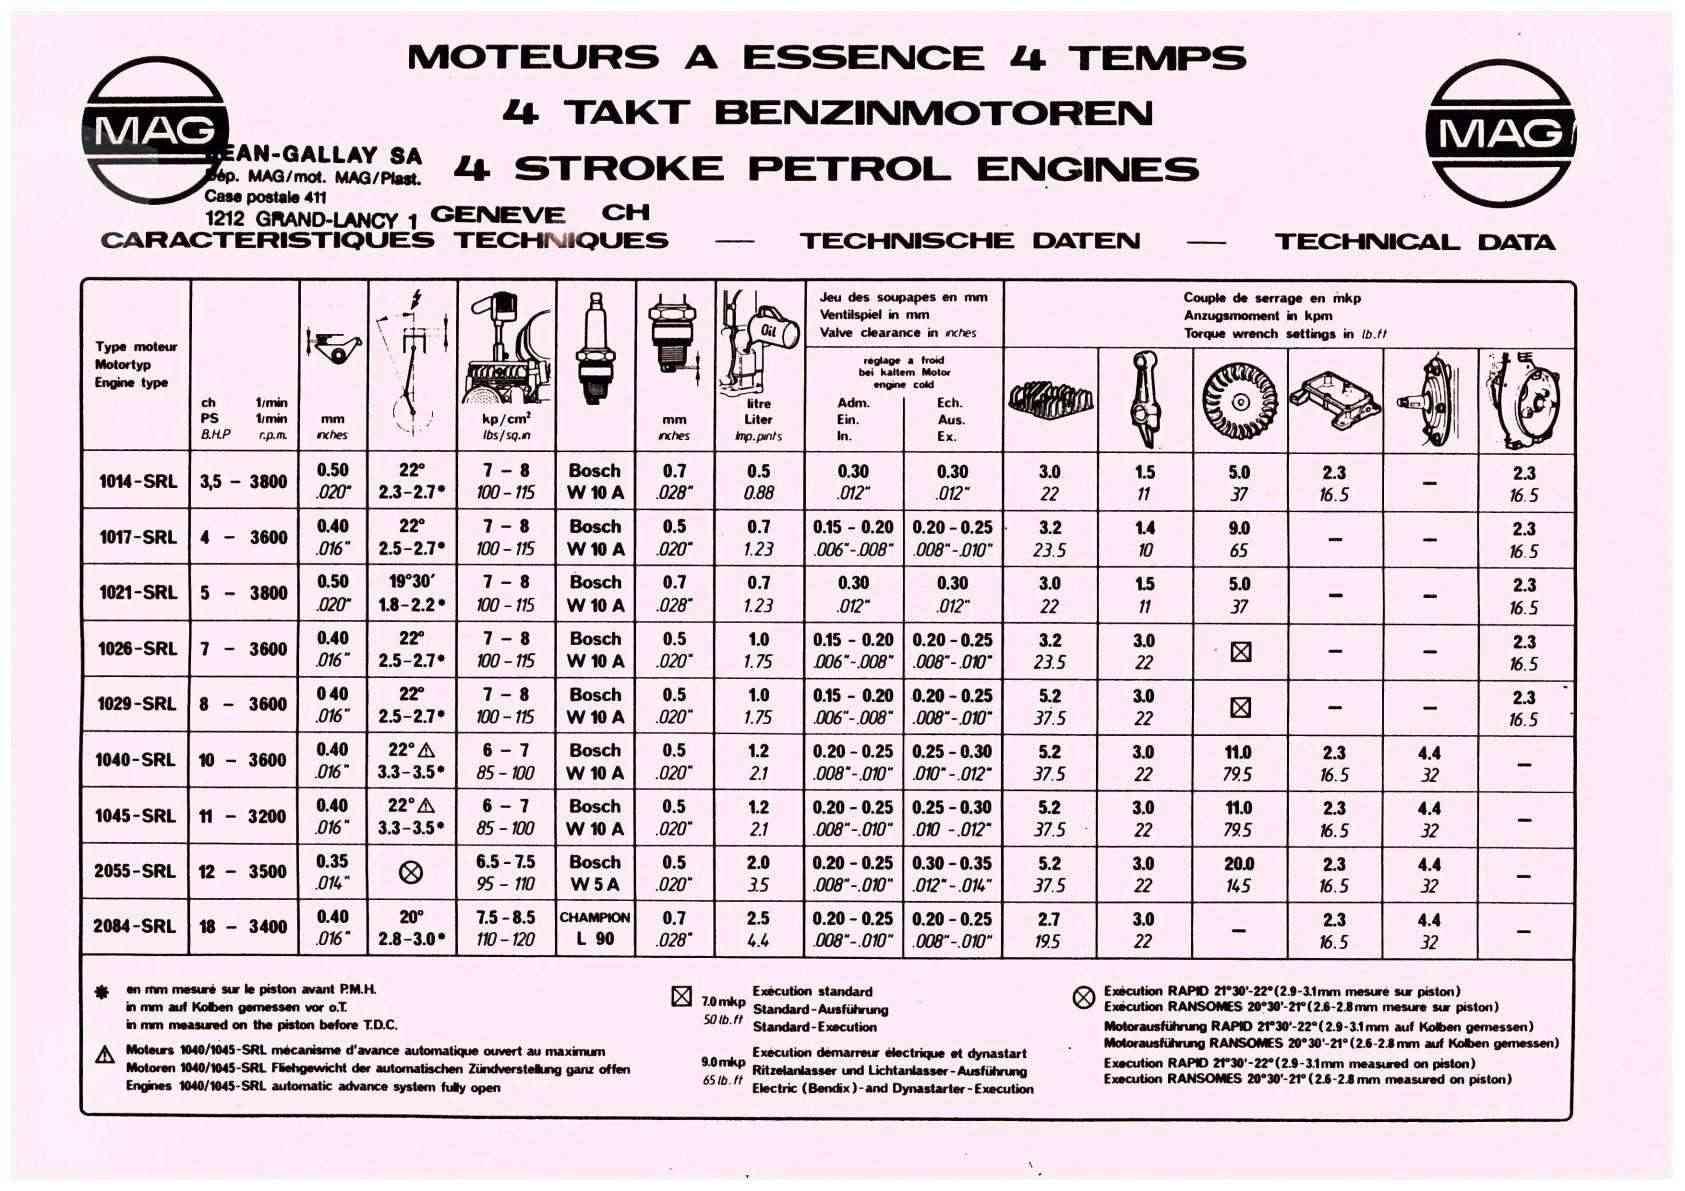 Notices Motoculture: Agria, Bernard, Bouyer, Ferrari, Goldoni, Honda, Kubota, Lombardini, Motostandard, Staub, Wolf ... Uw1114